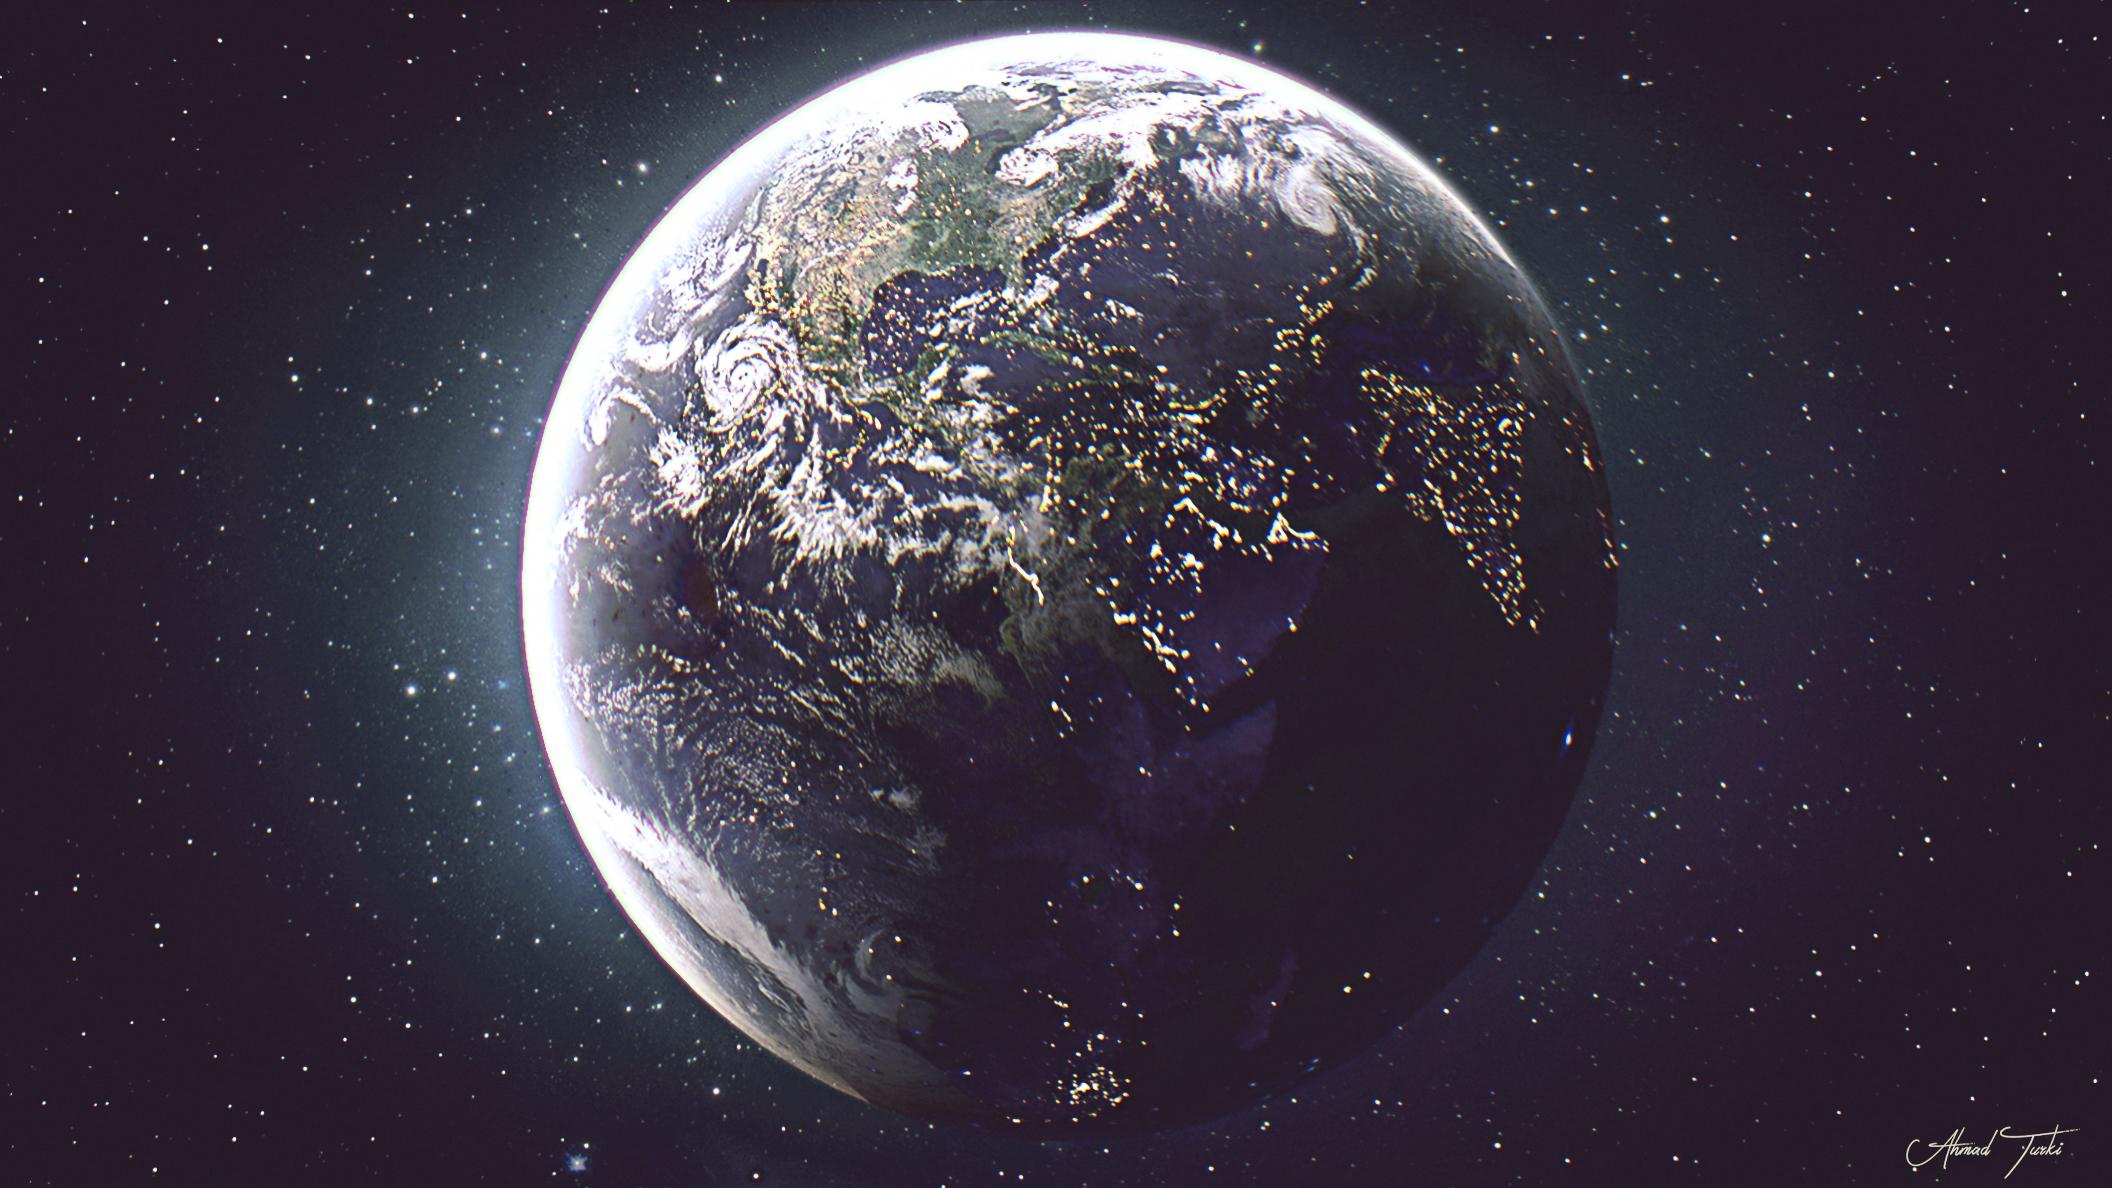 Earth by AhmadTurk